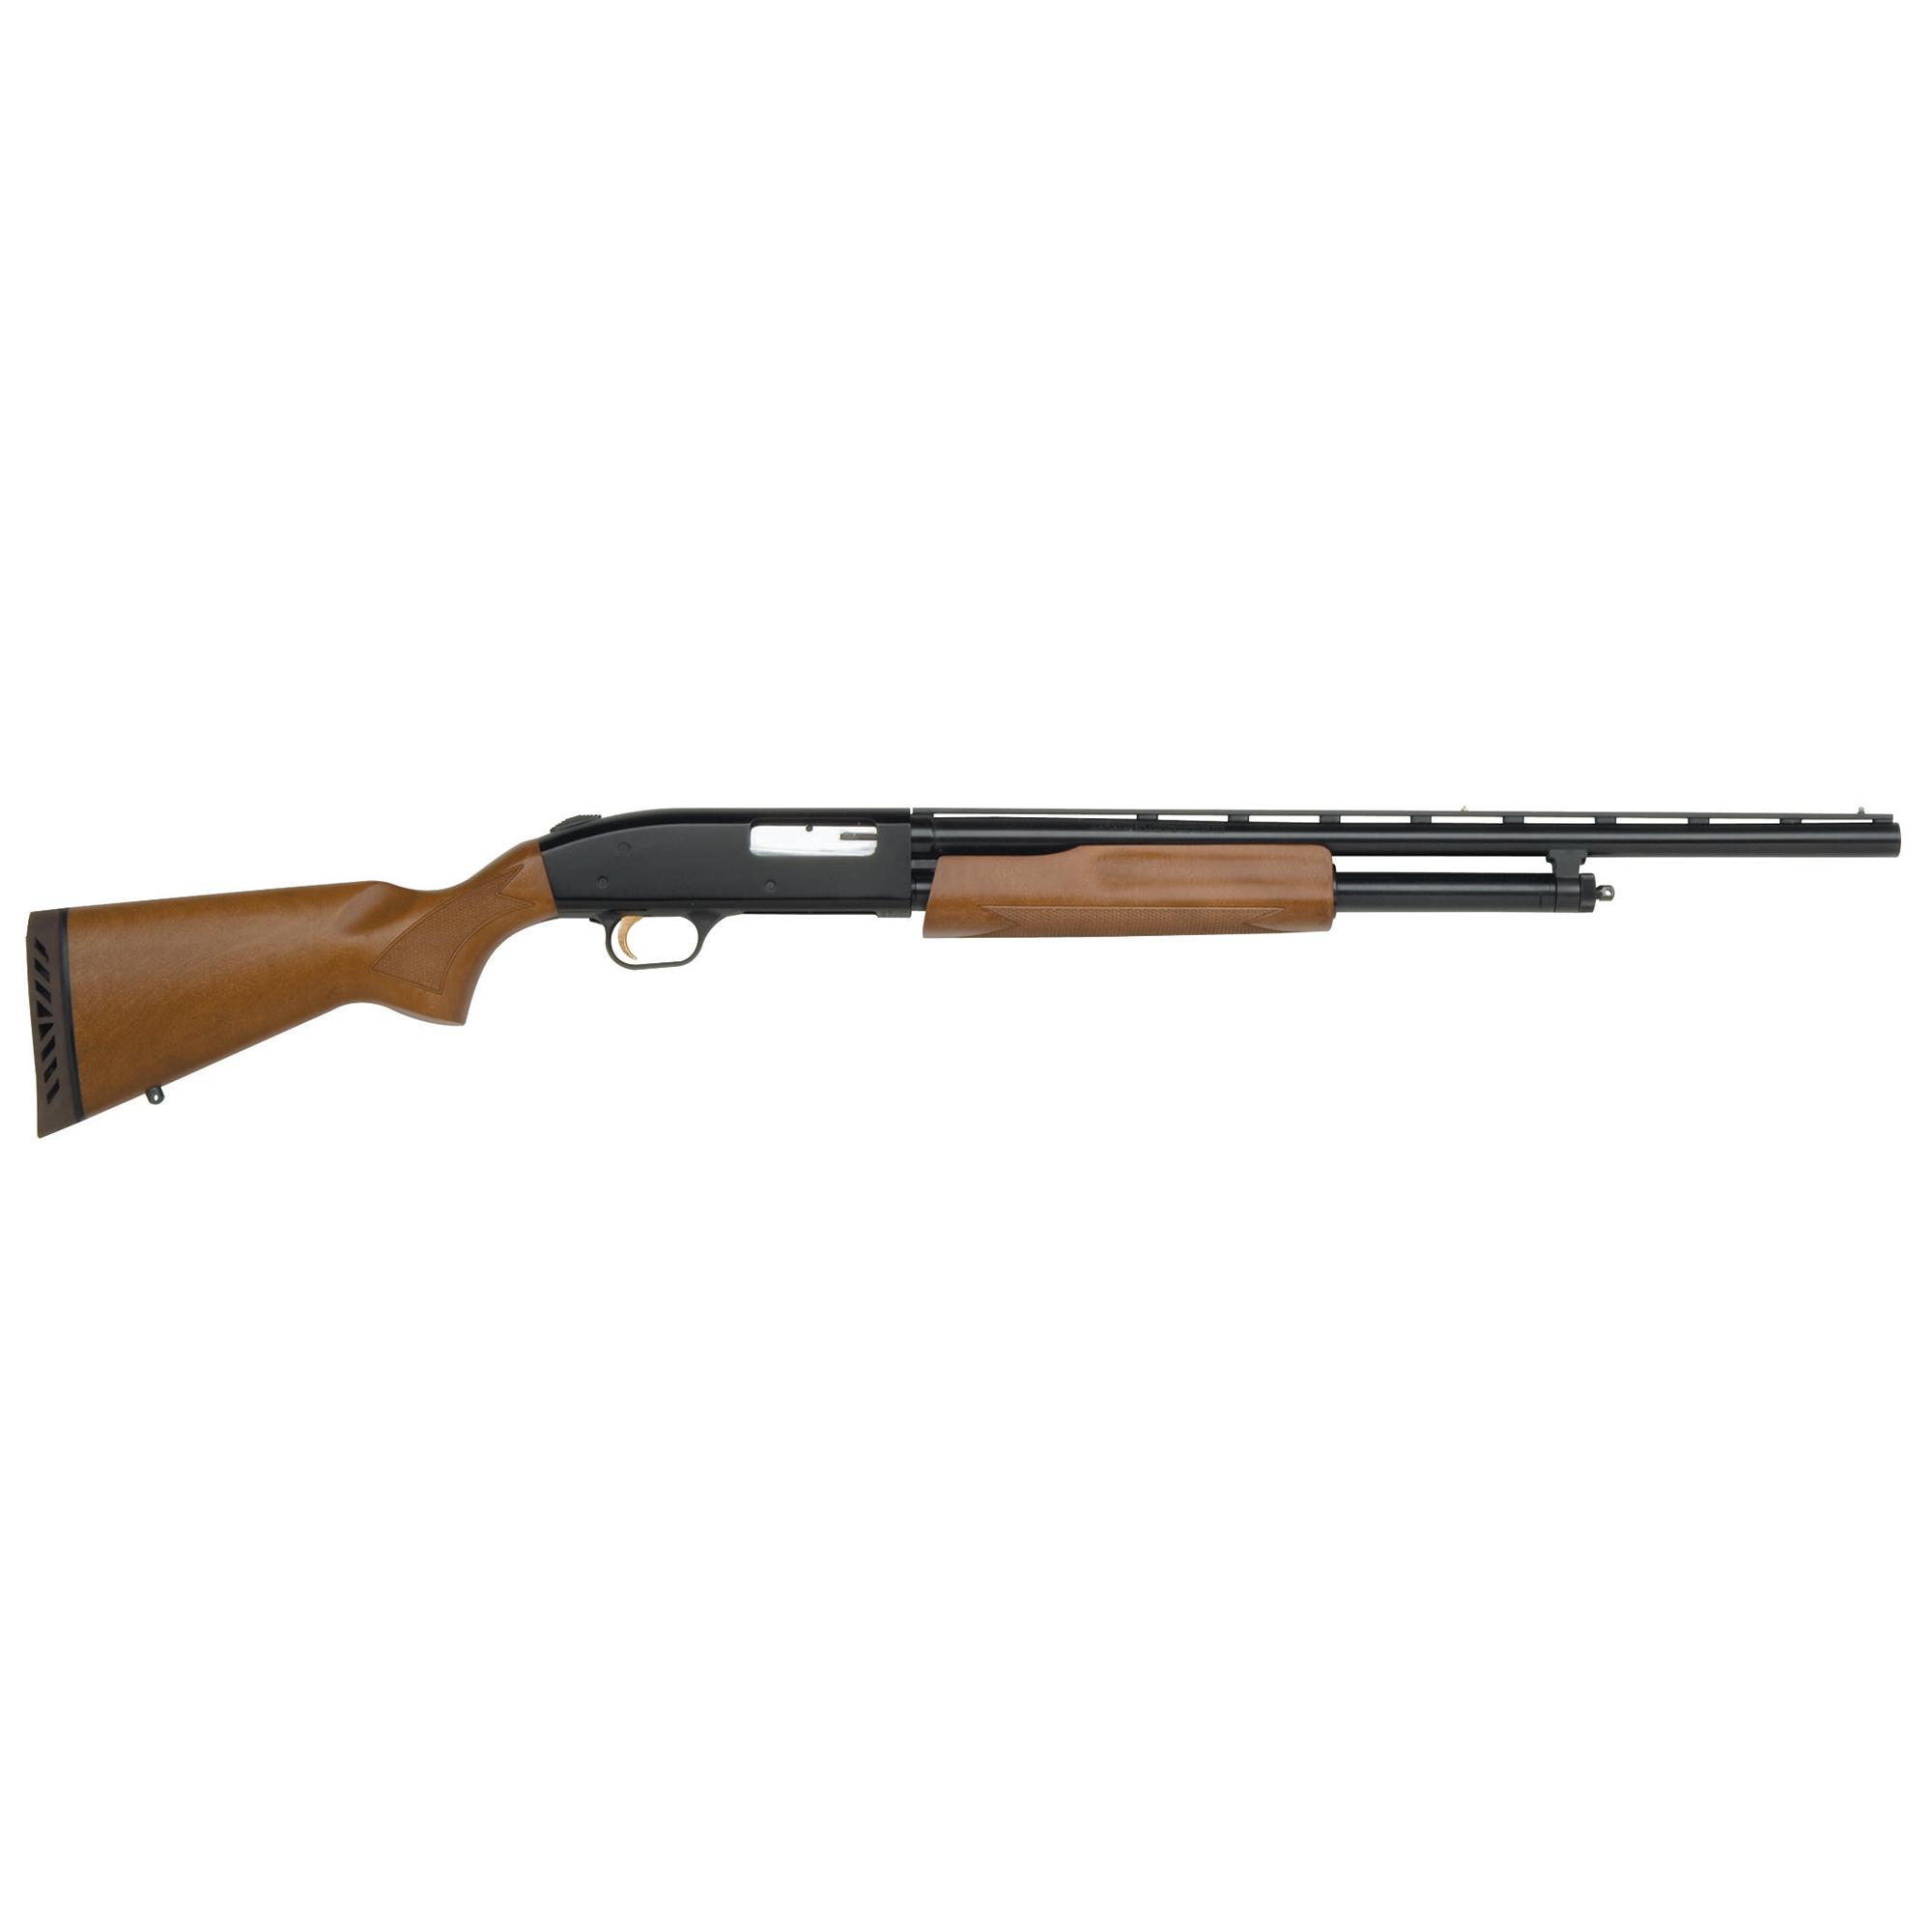 Mossberg 500 Youth Bantam Shotgun